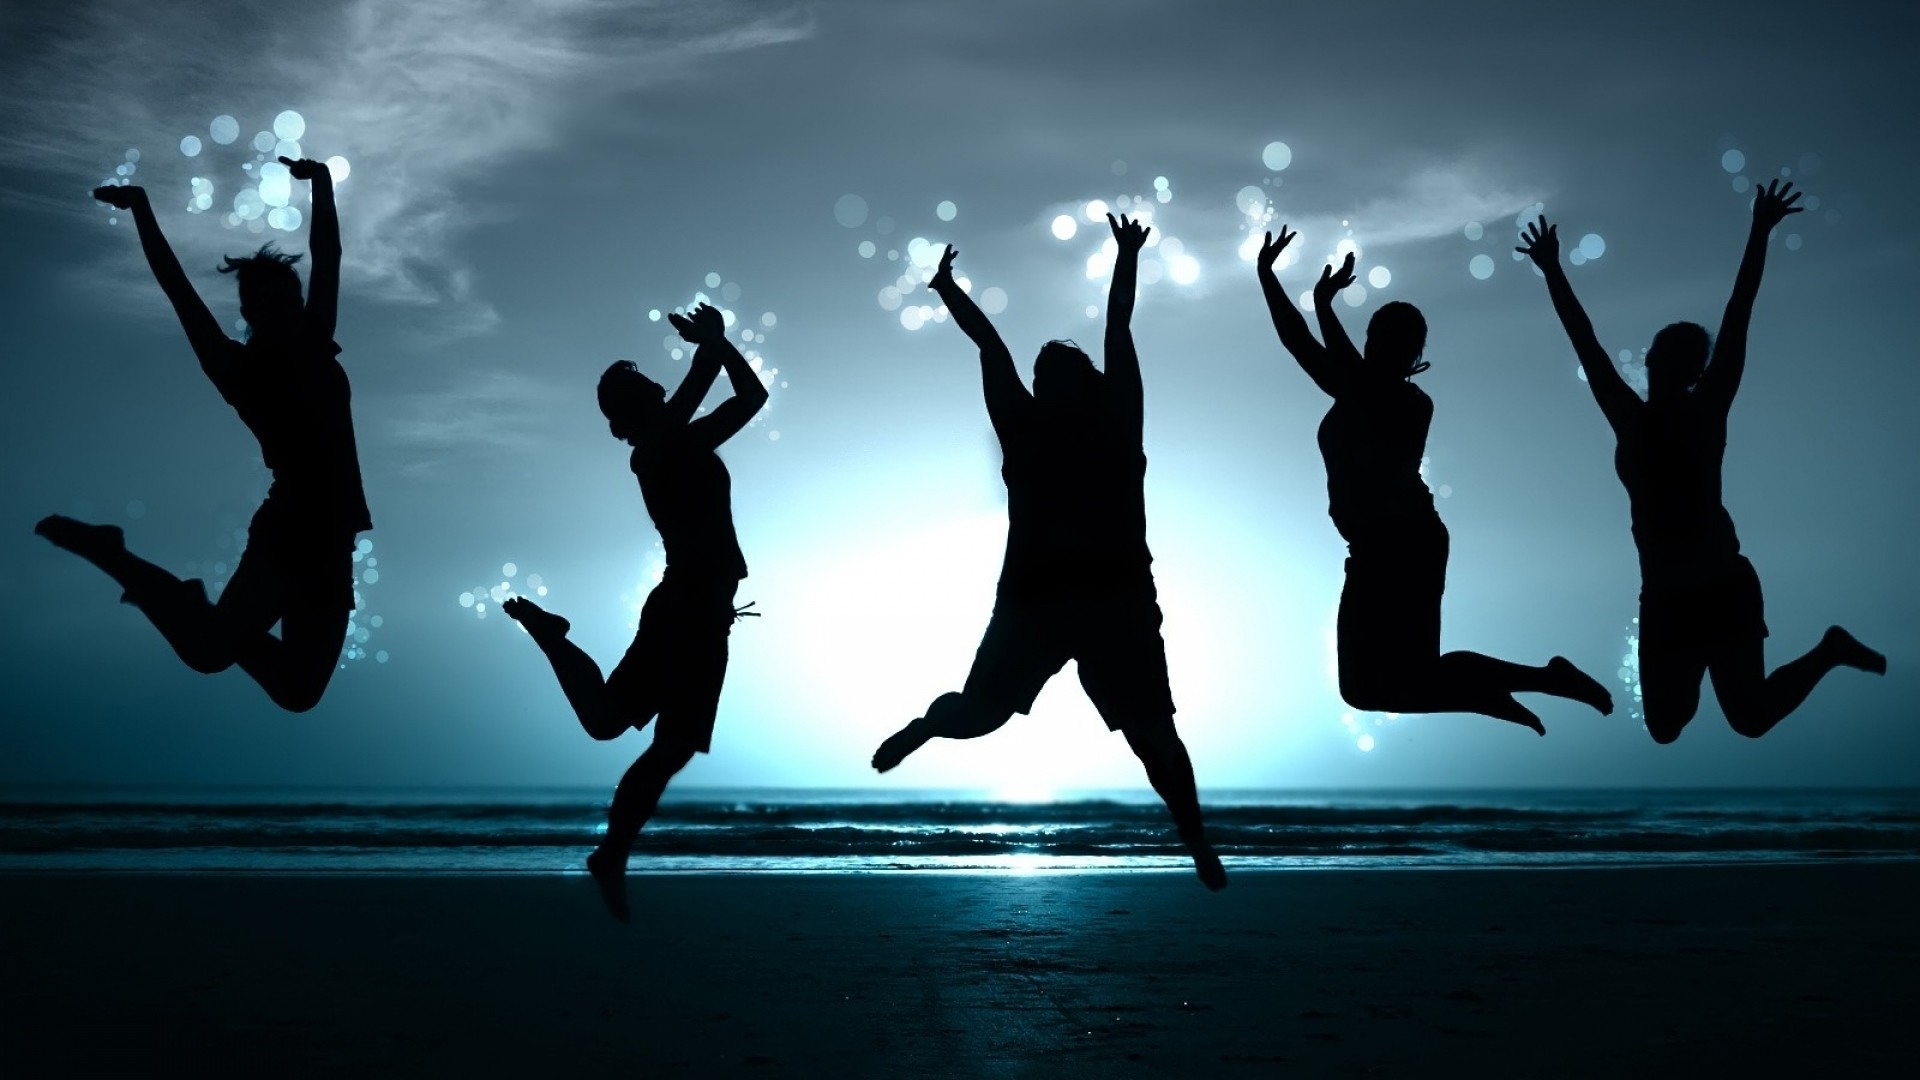 Wallpaper people, jump, happiness, beach, shadow, image